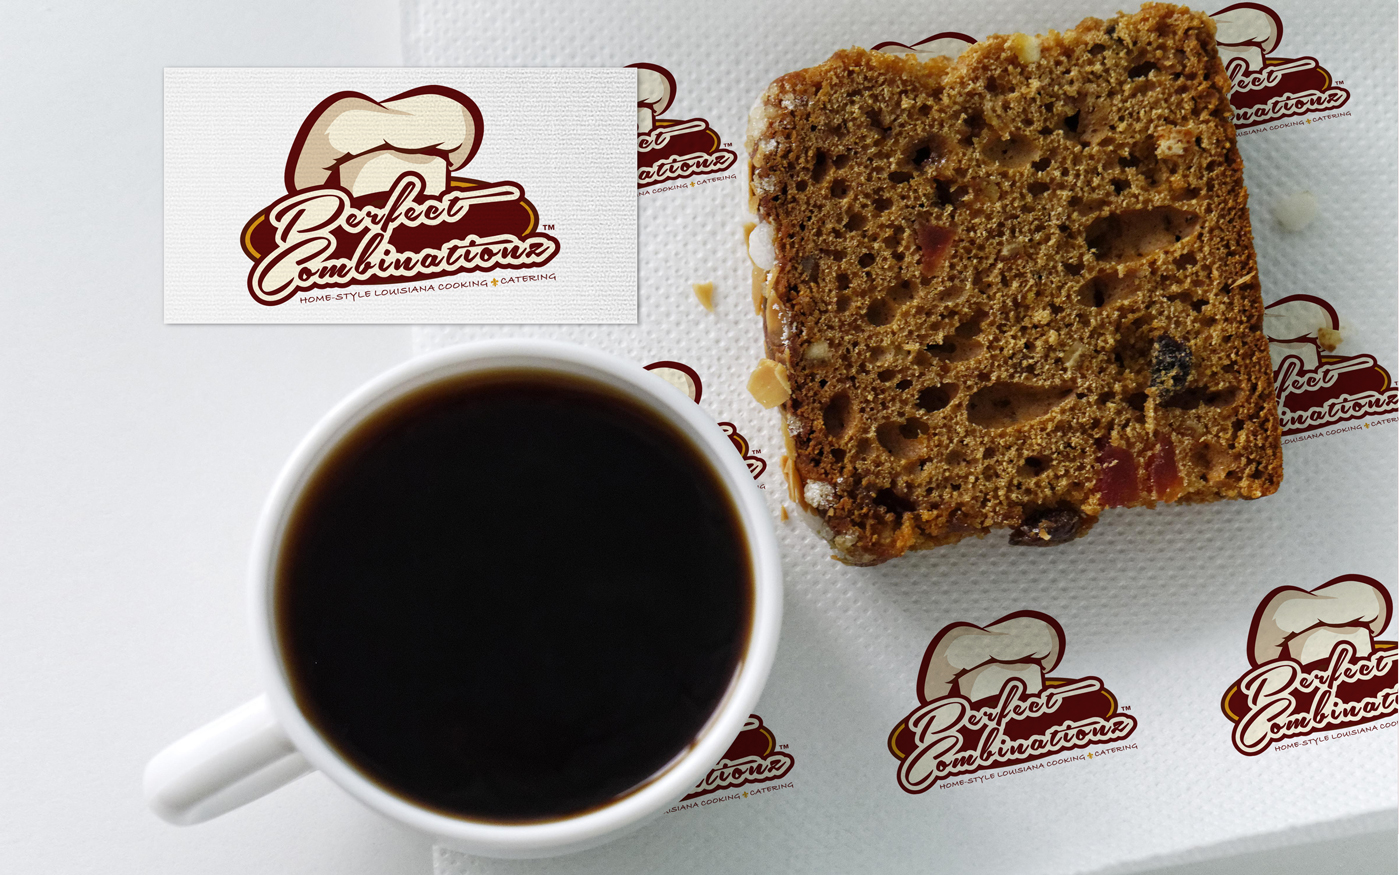 pce_coffe_cake.jpg